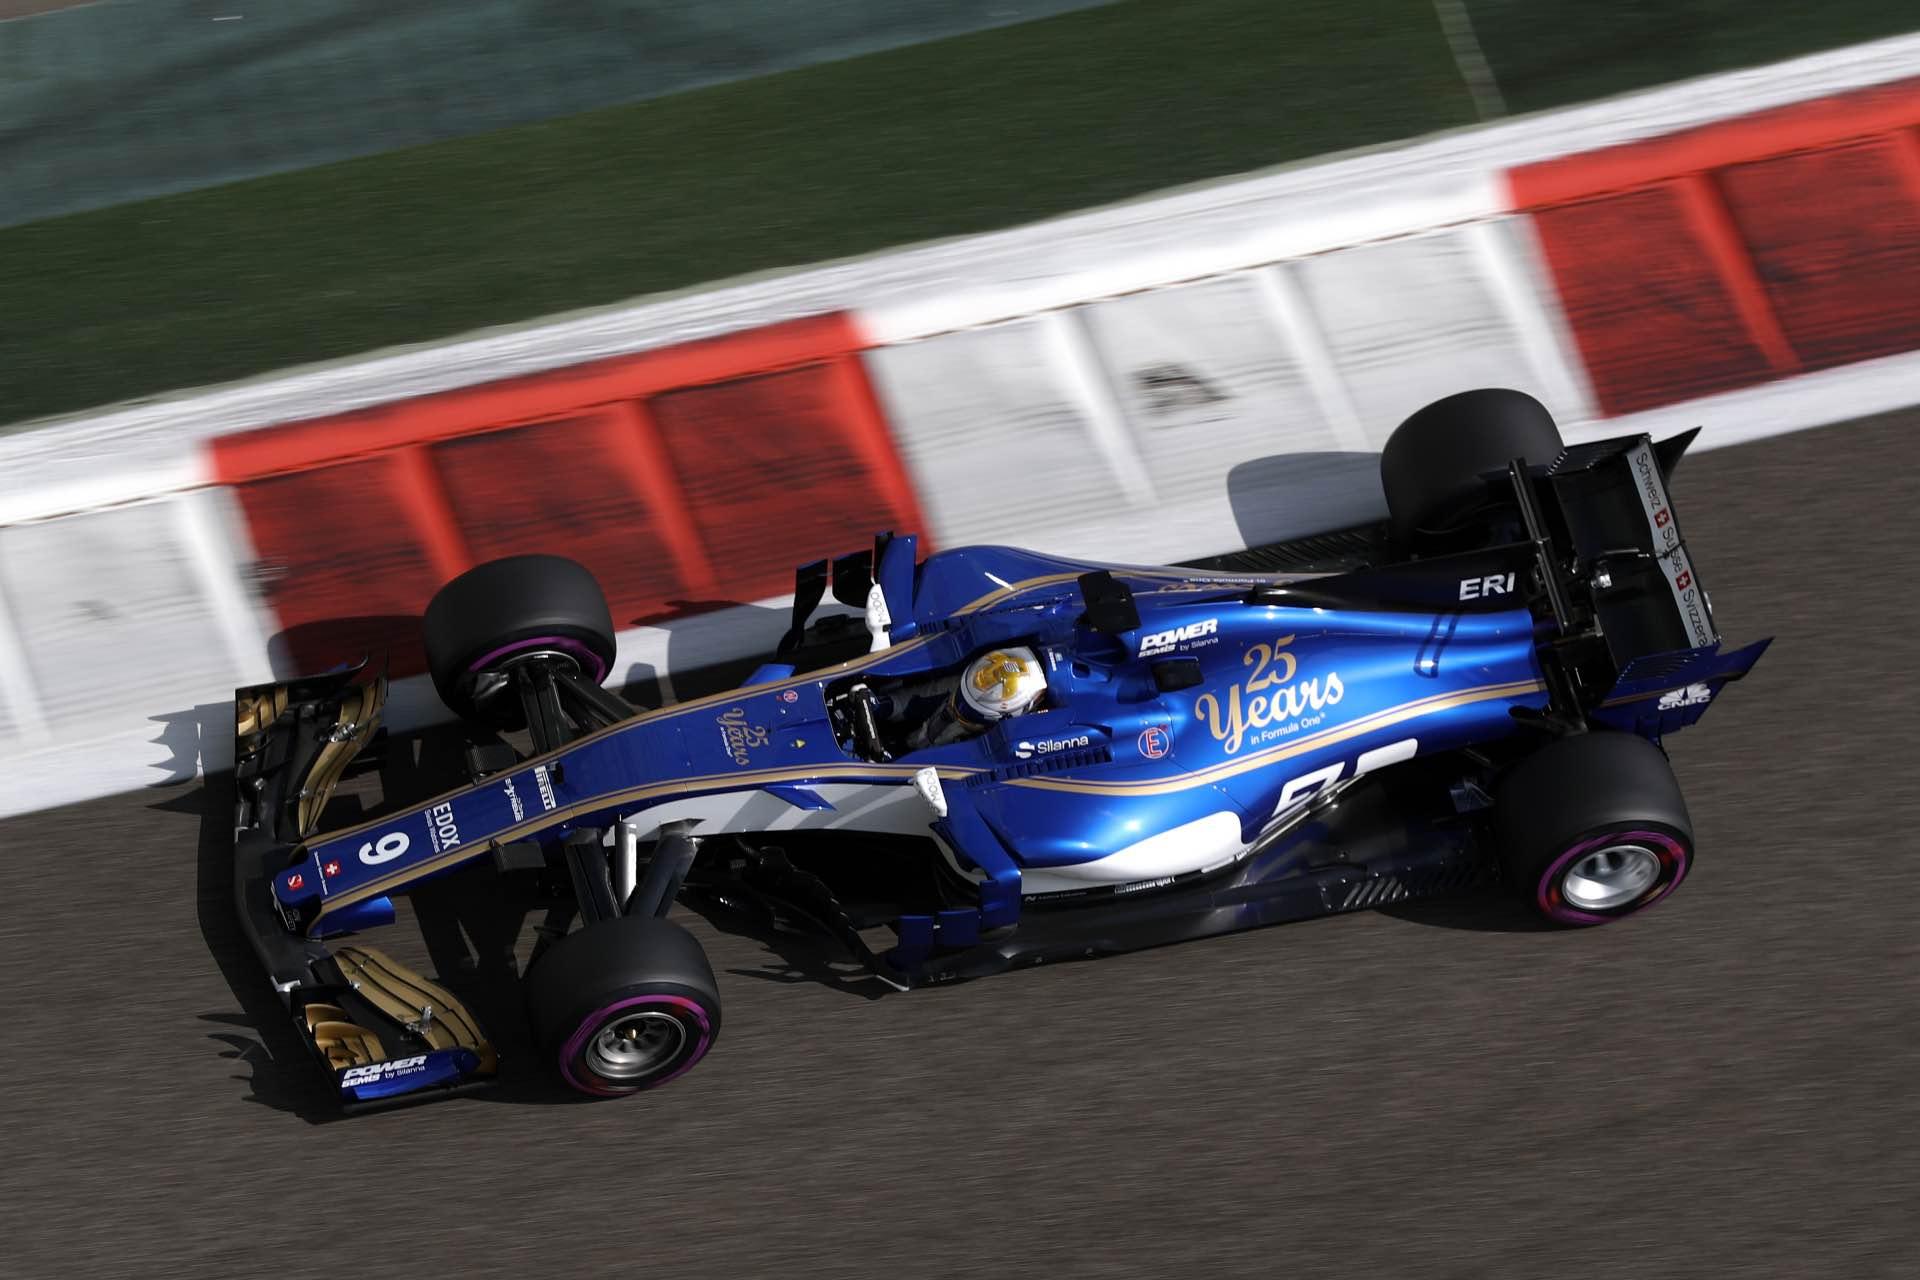 Abu Dhabi GP Friday 24/11/17